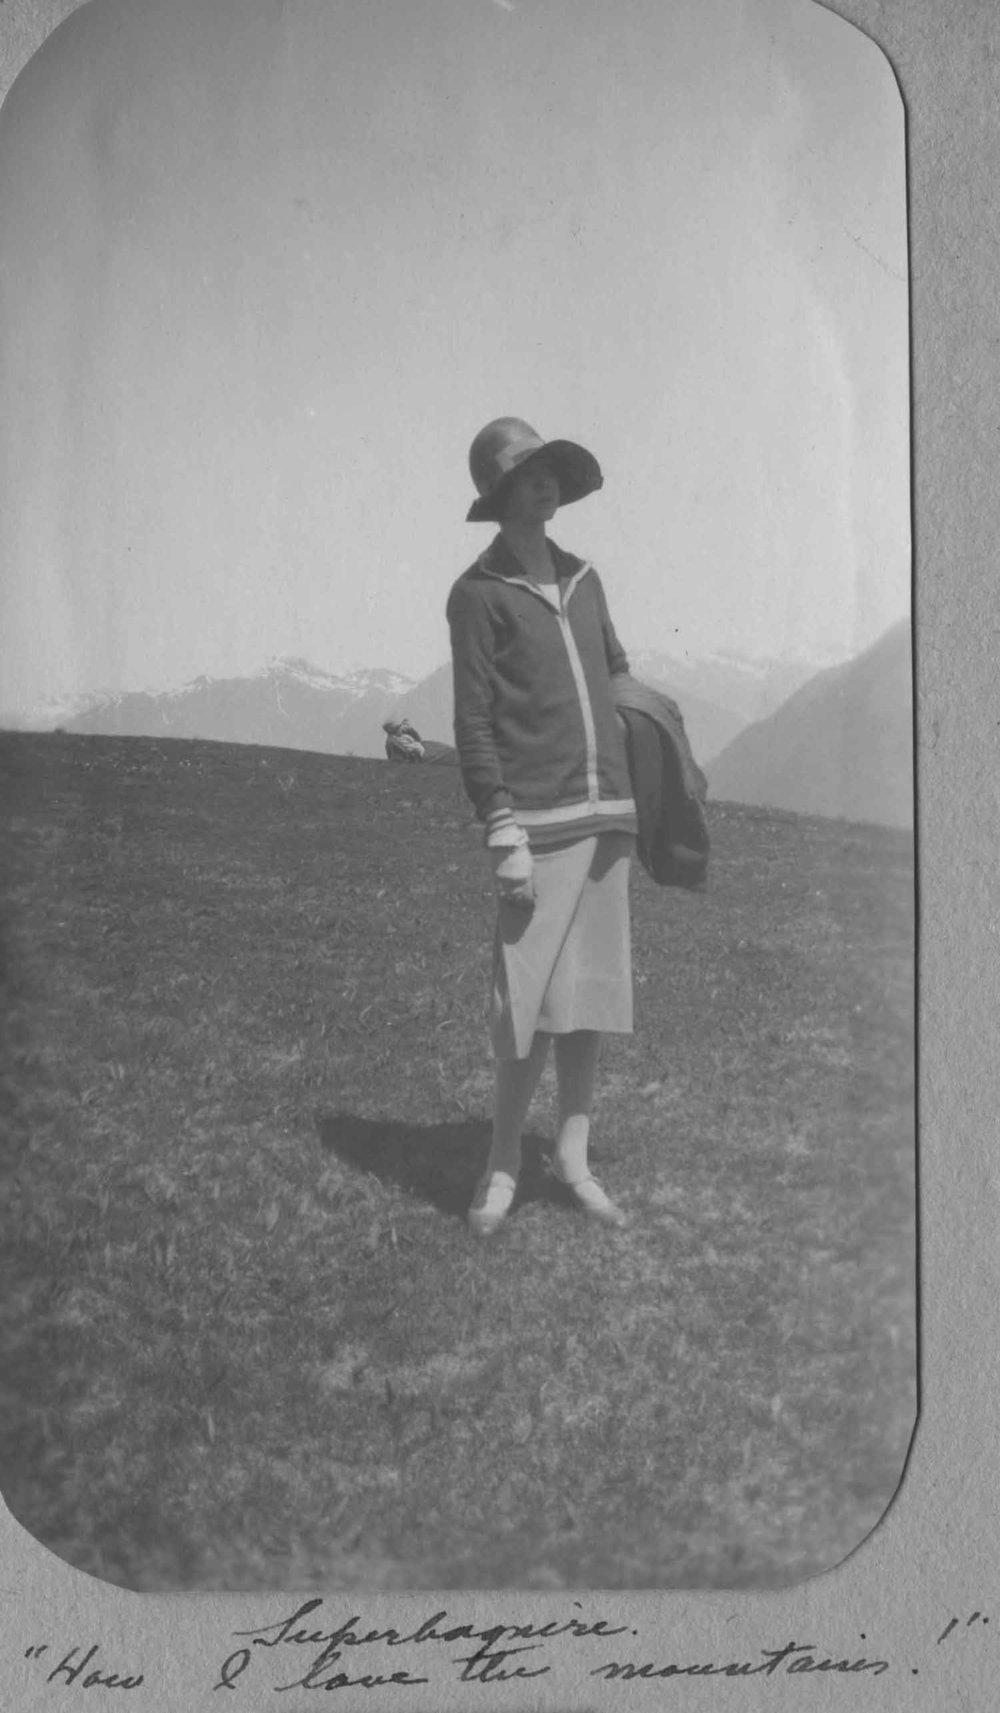 Anais 1927 3 Apr Pyranees.jpg